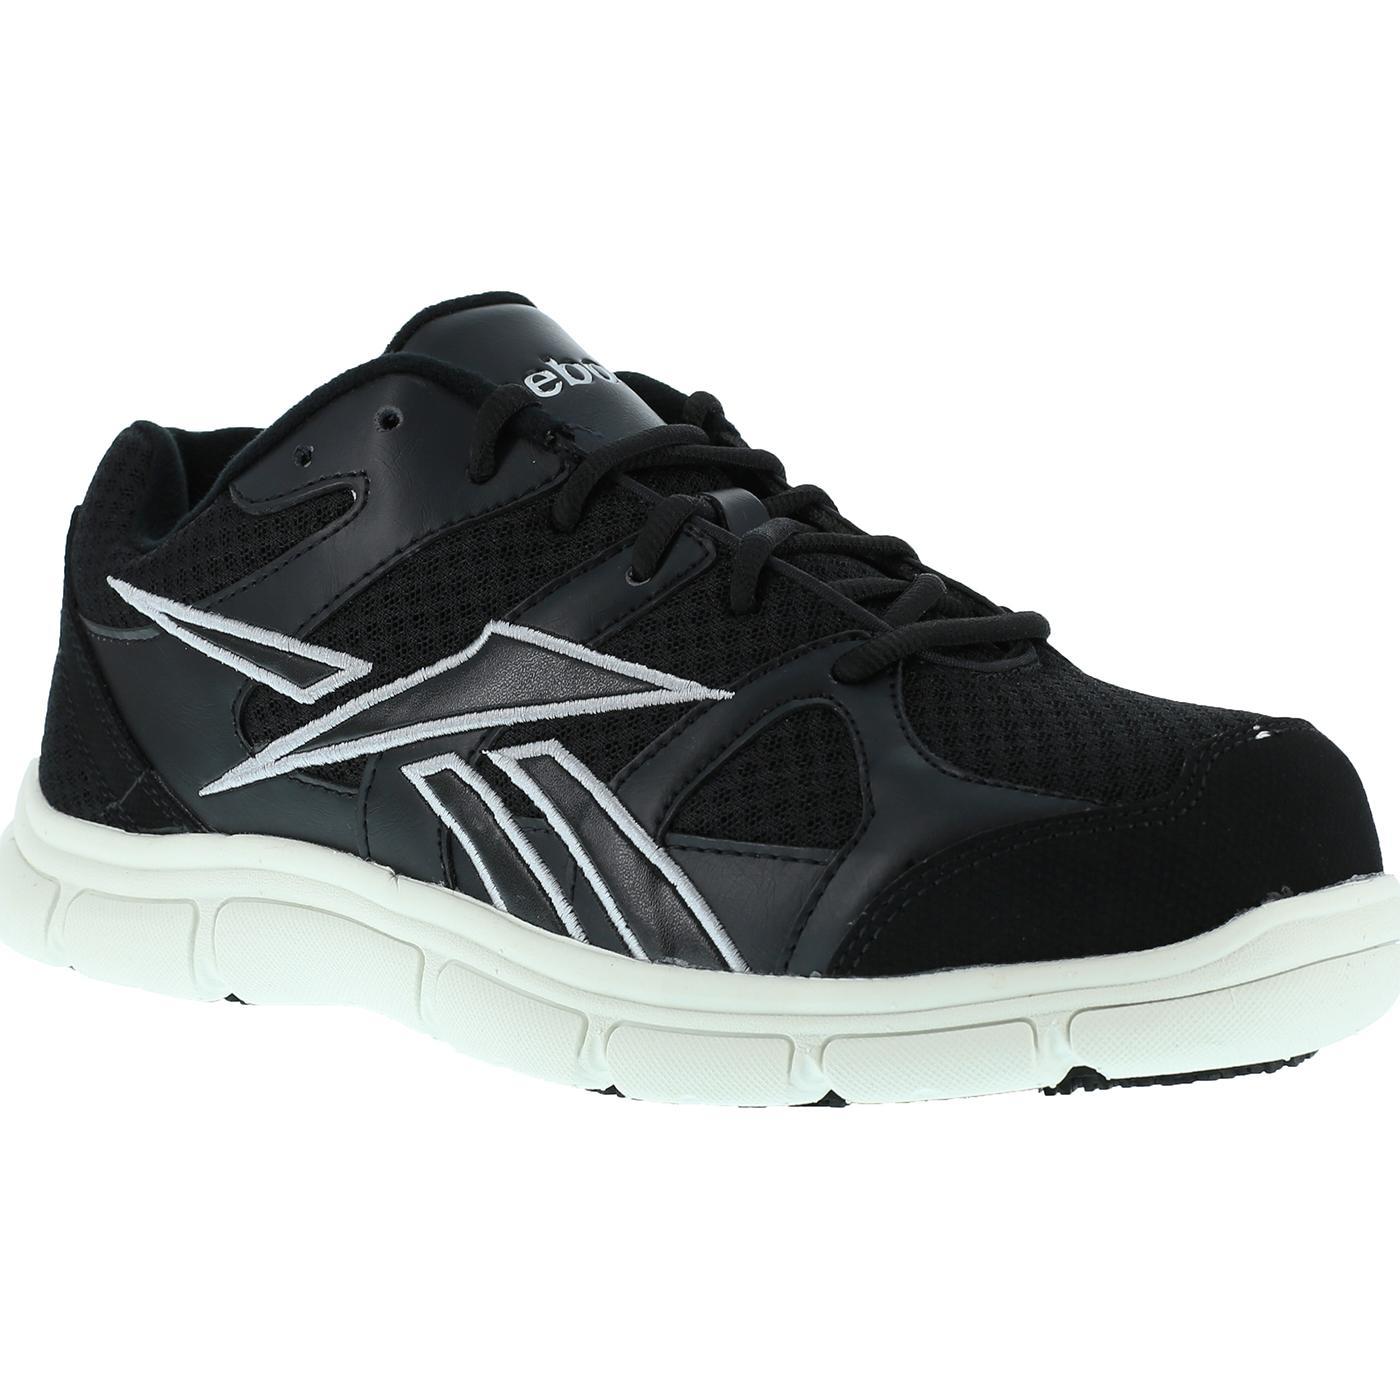 s composite toe slip resistant athletic shoe reebok